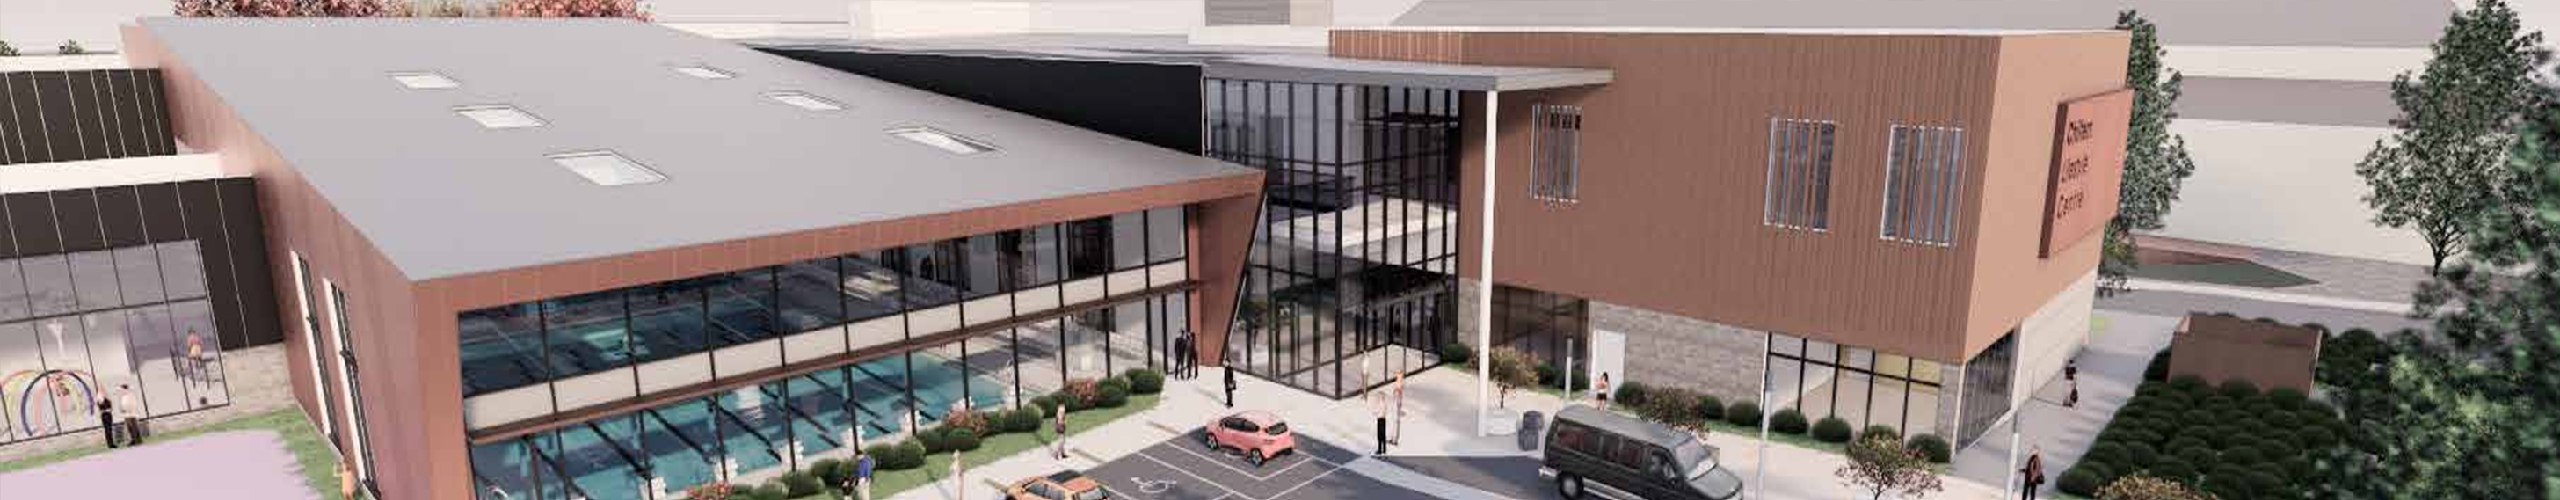 Chiltern Lifestyle Centre 2018 design 2